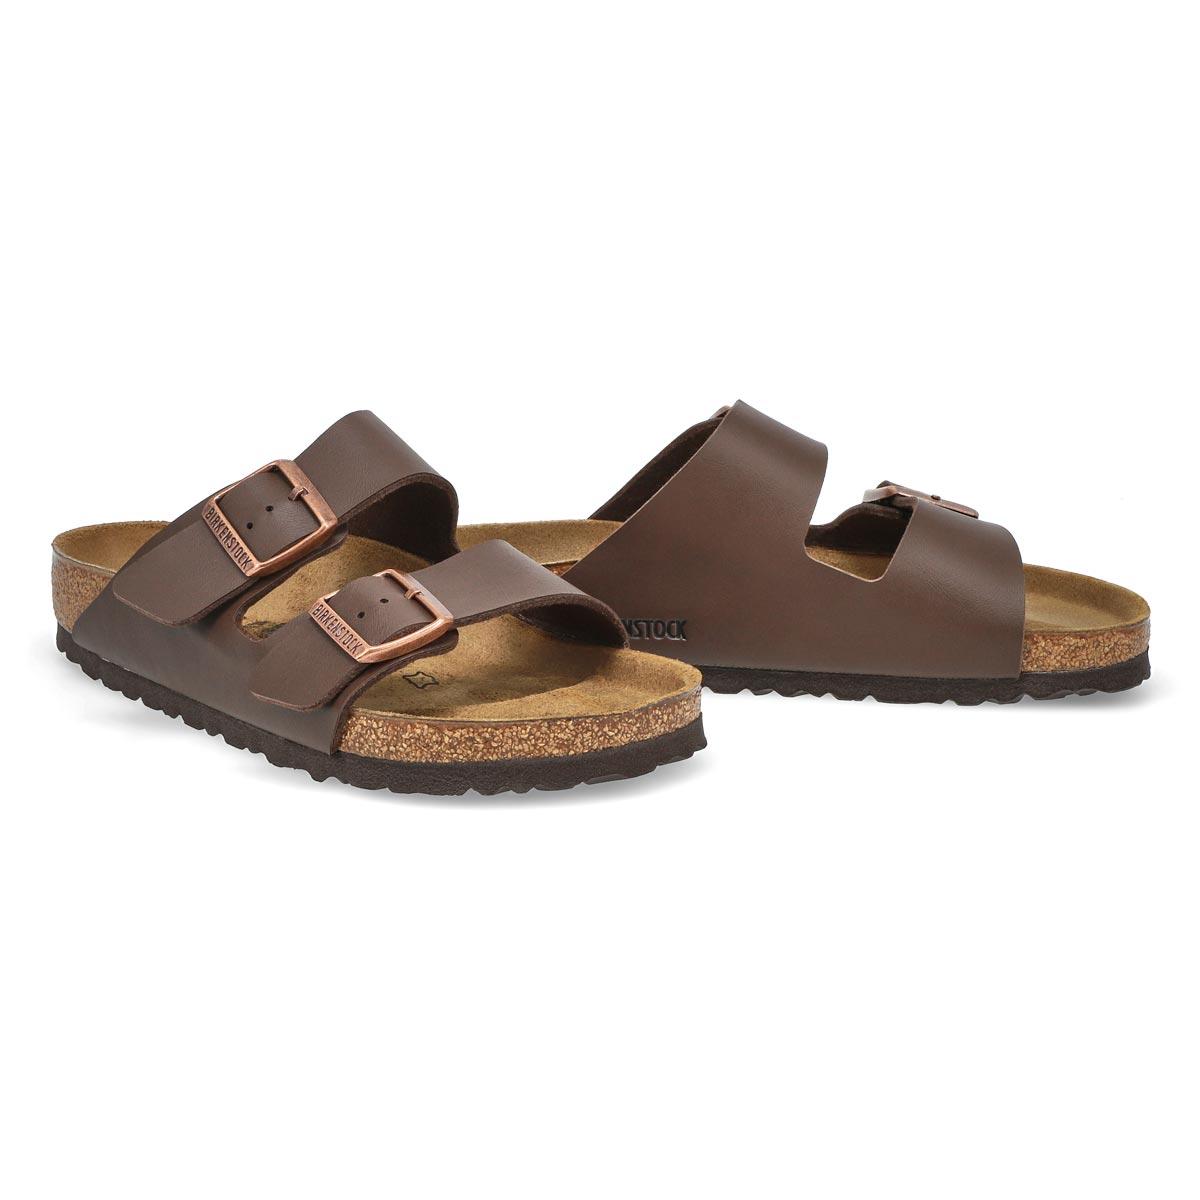 Women's Arizona BF Sandal - Dark Brown